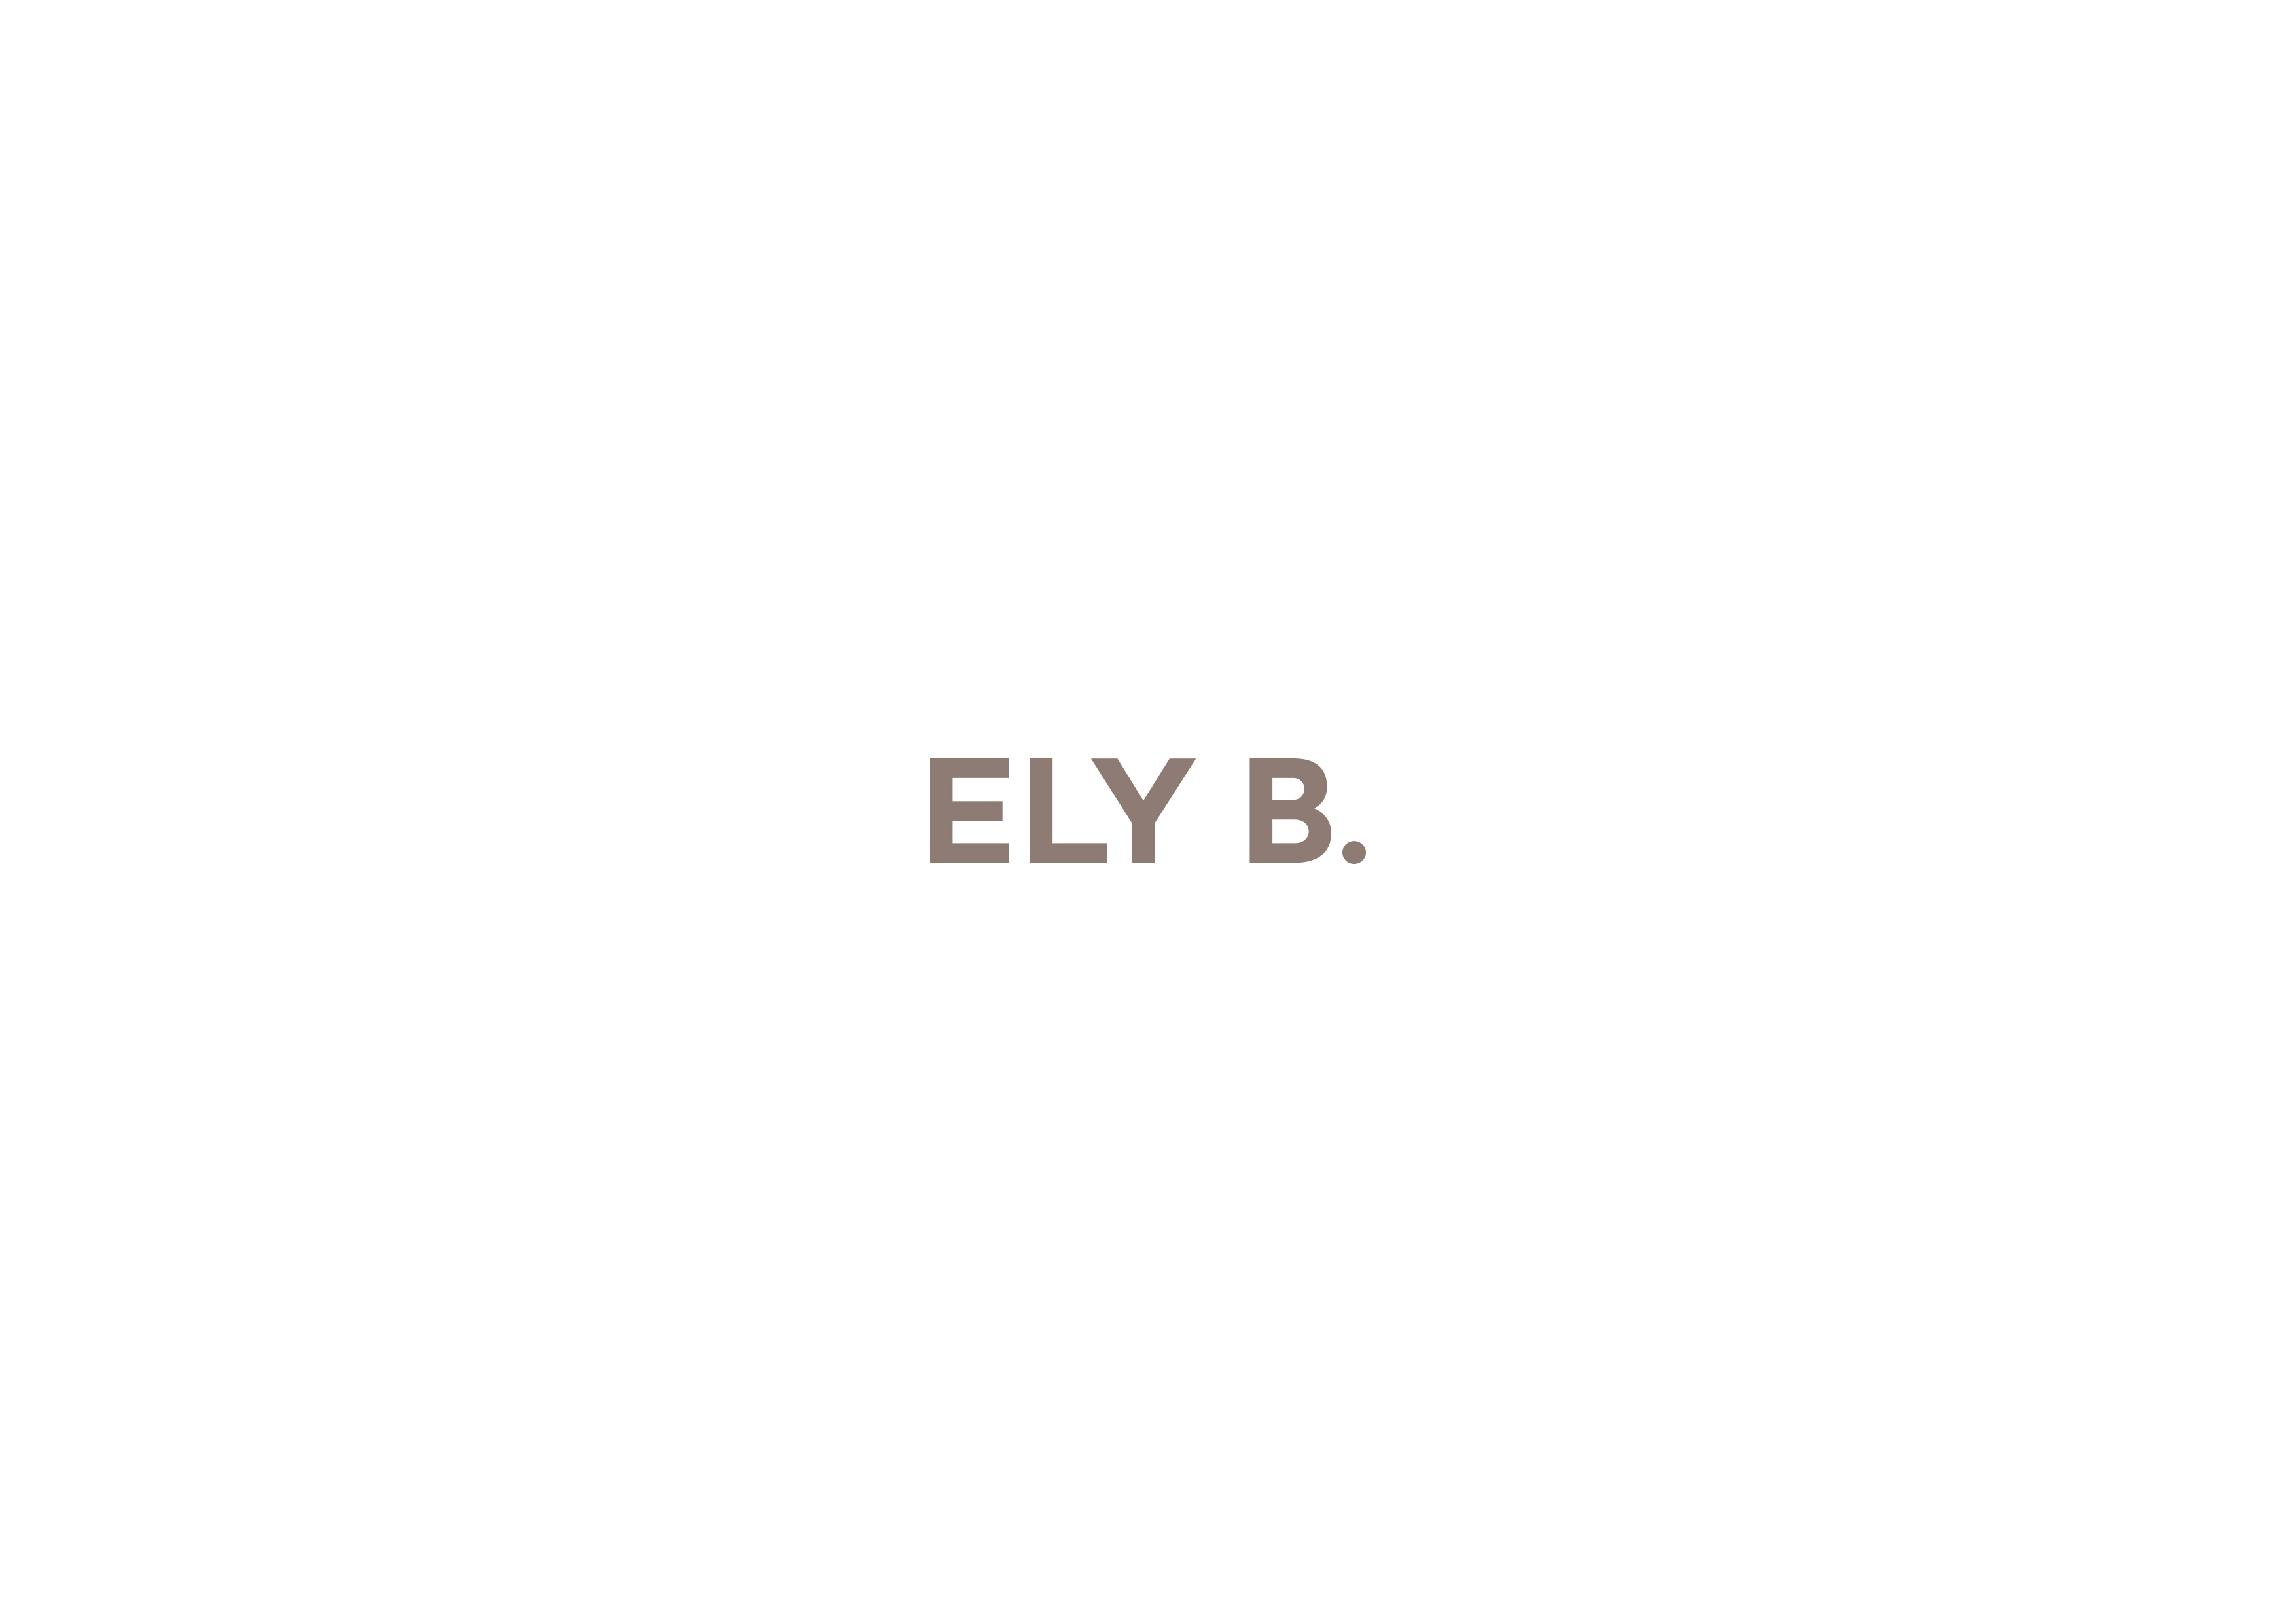 ELY B LETTRING